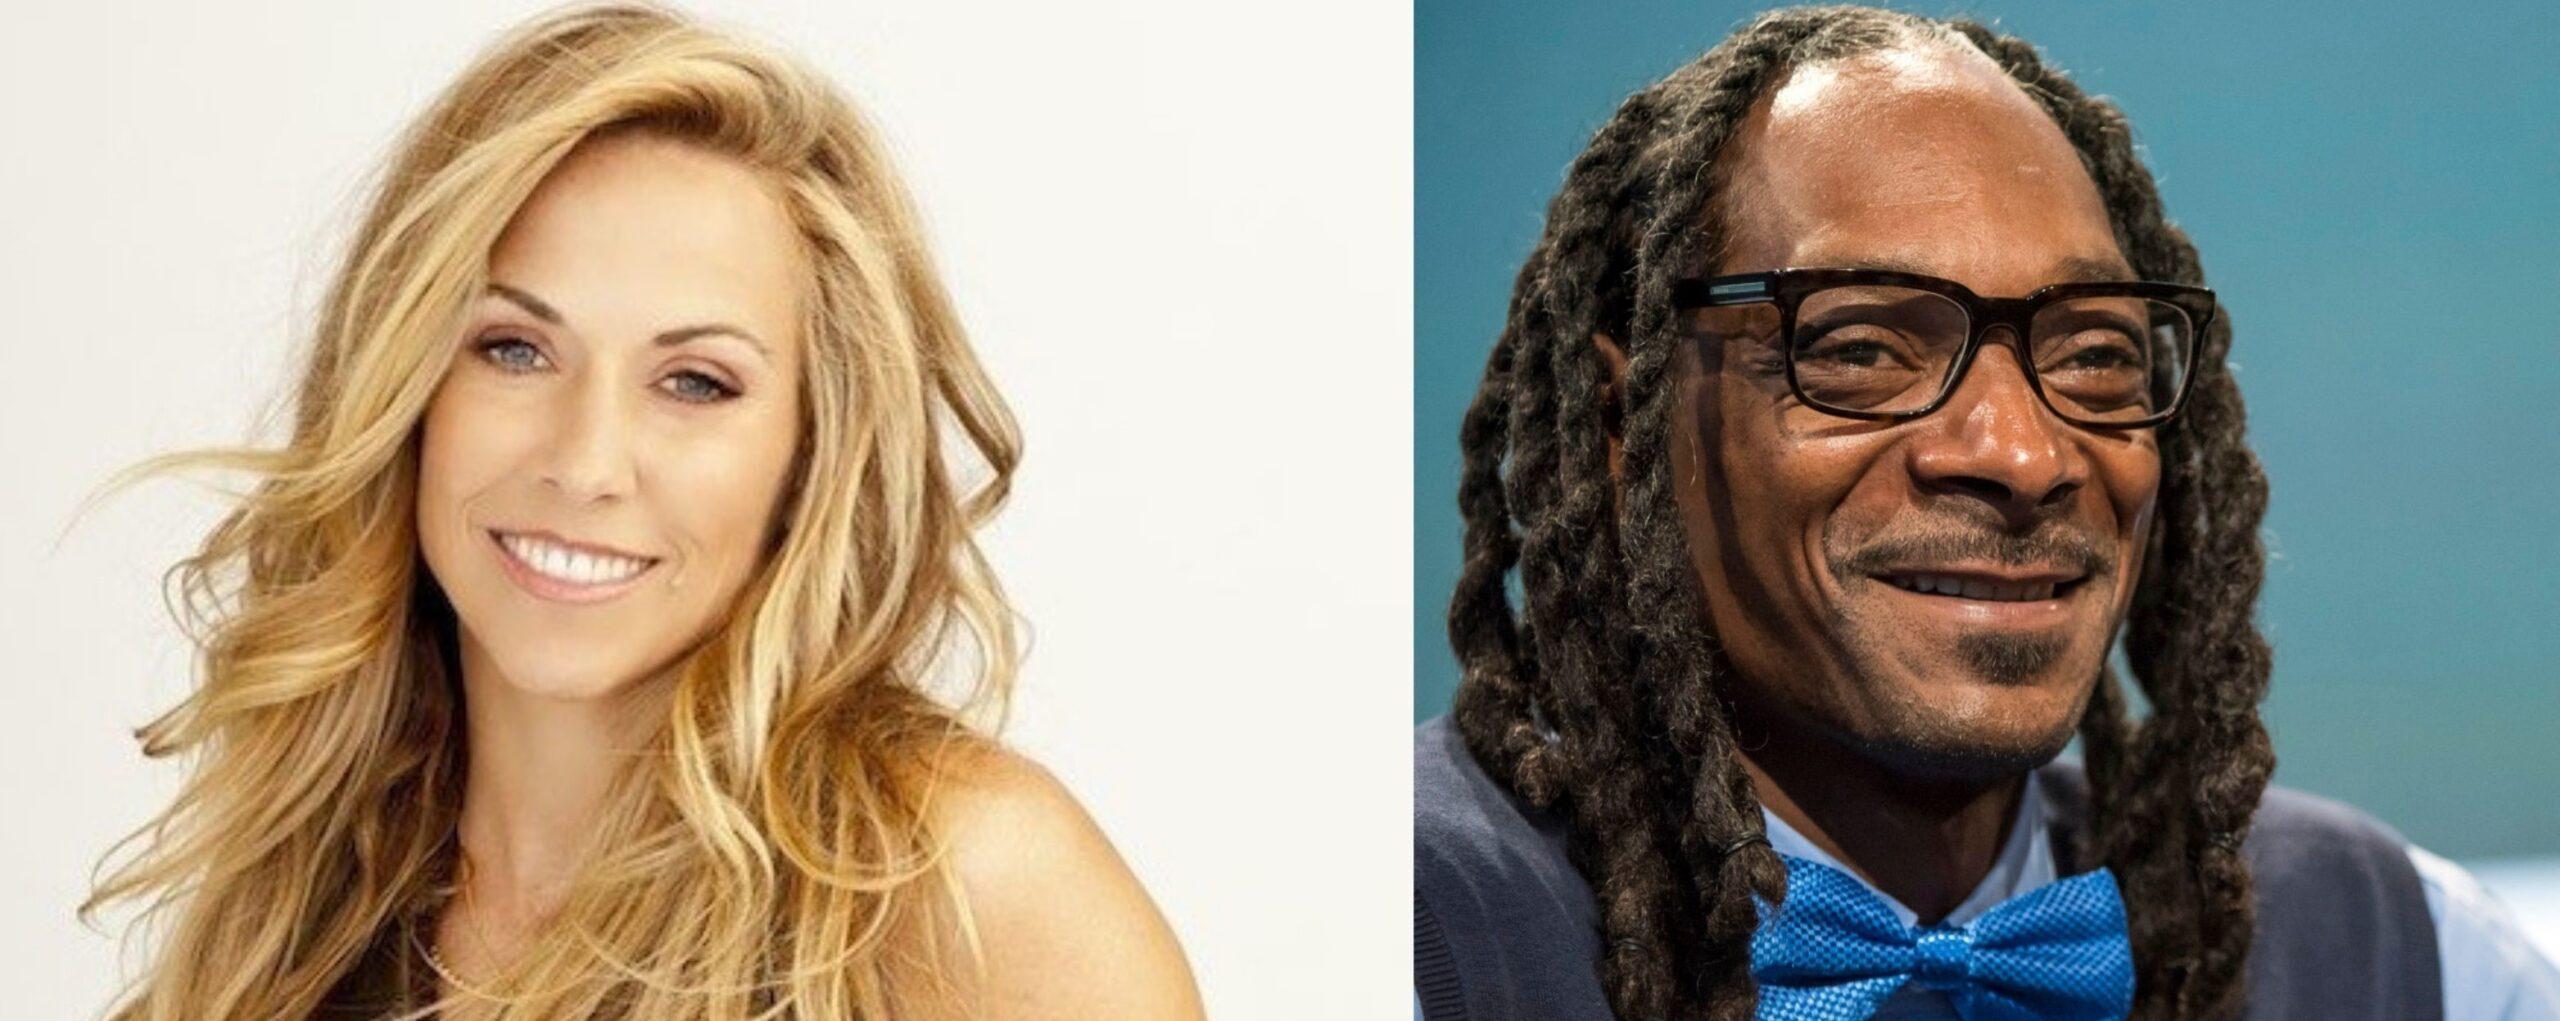 Sherly Crow, Snoop Dogg, and Bon Jovi to Headline NAACP Fundraiser